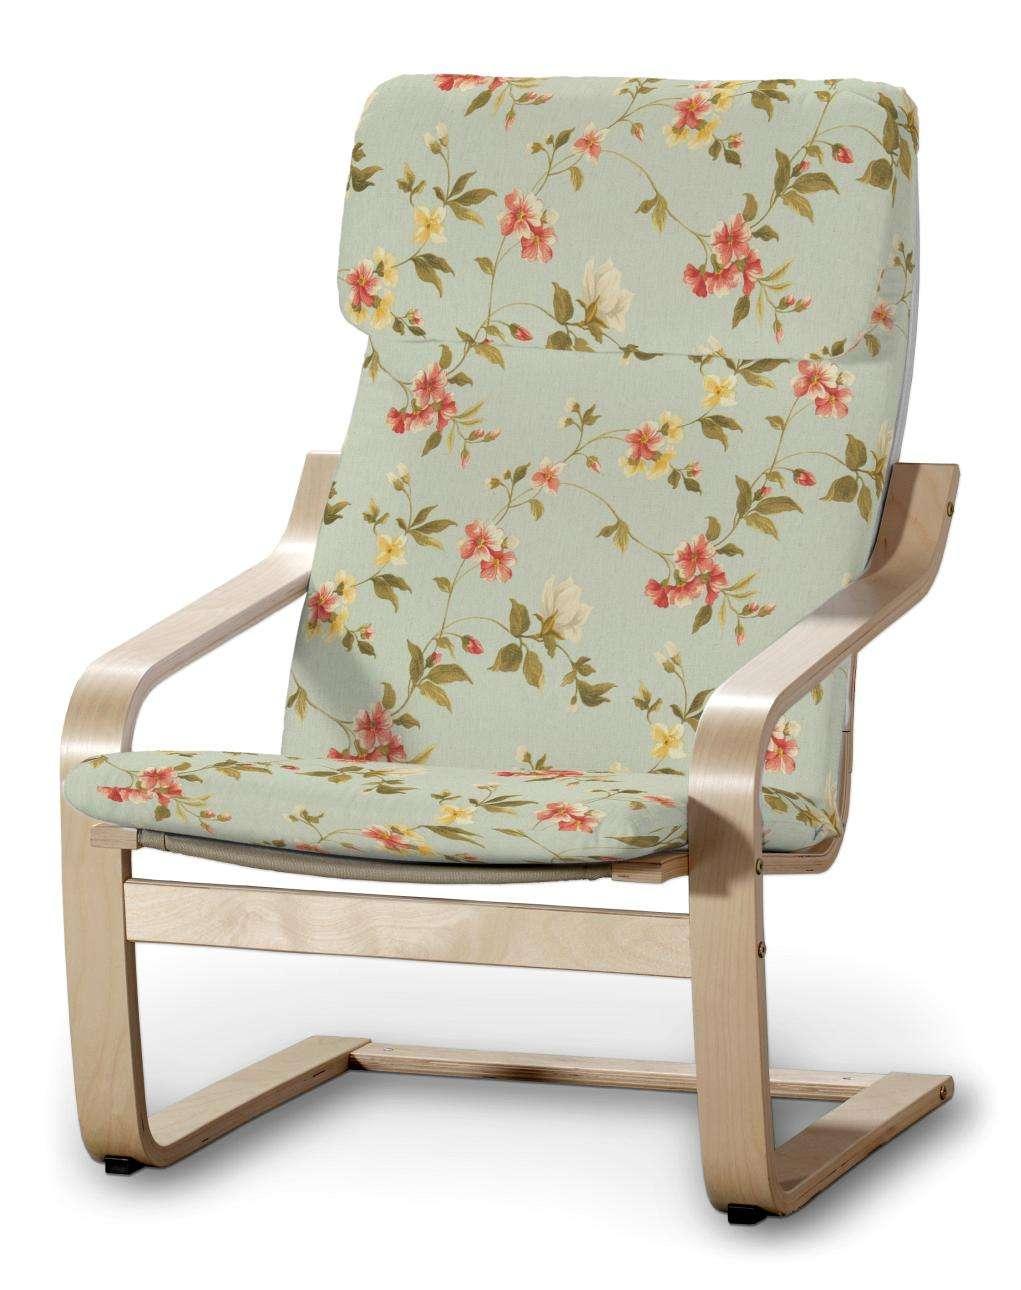 POÄNG  fotelio užvalkalas Poäng armchair kolekcijoje Londres, audinys: 124-65